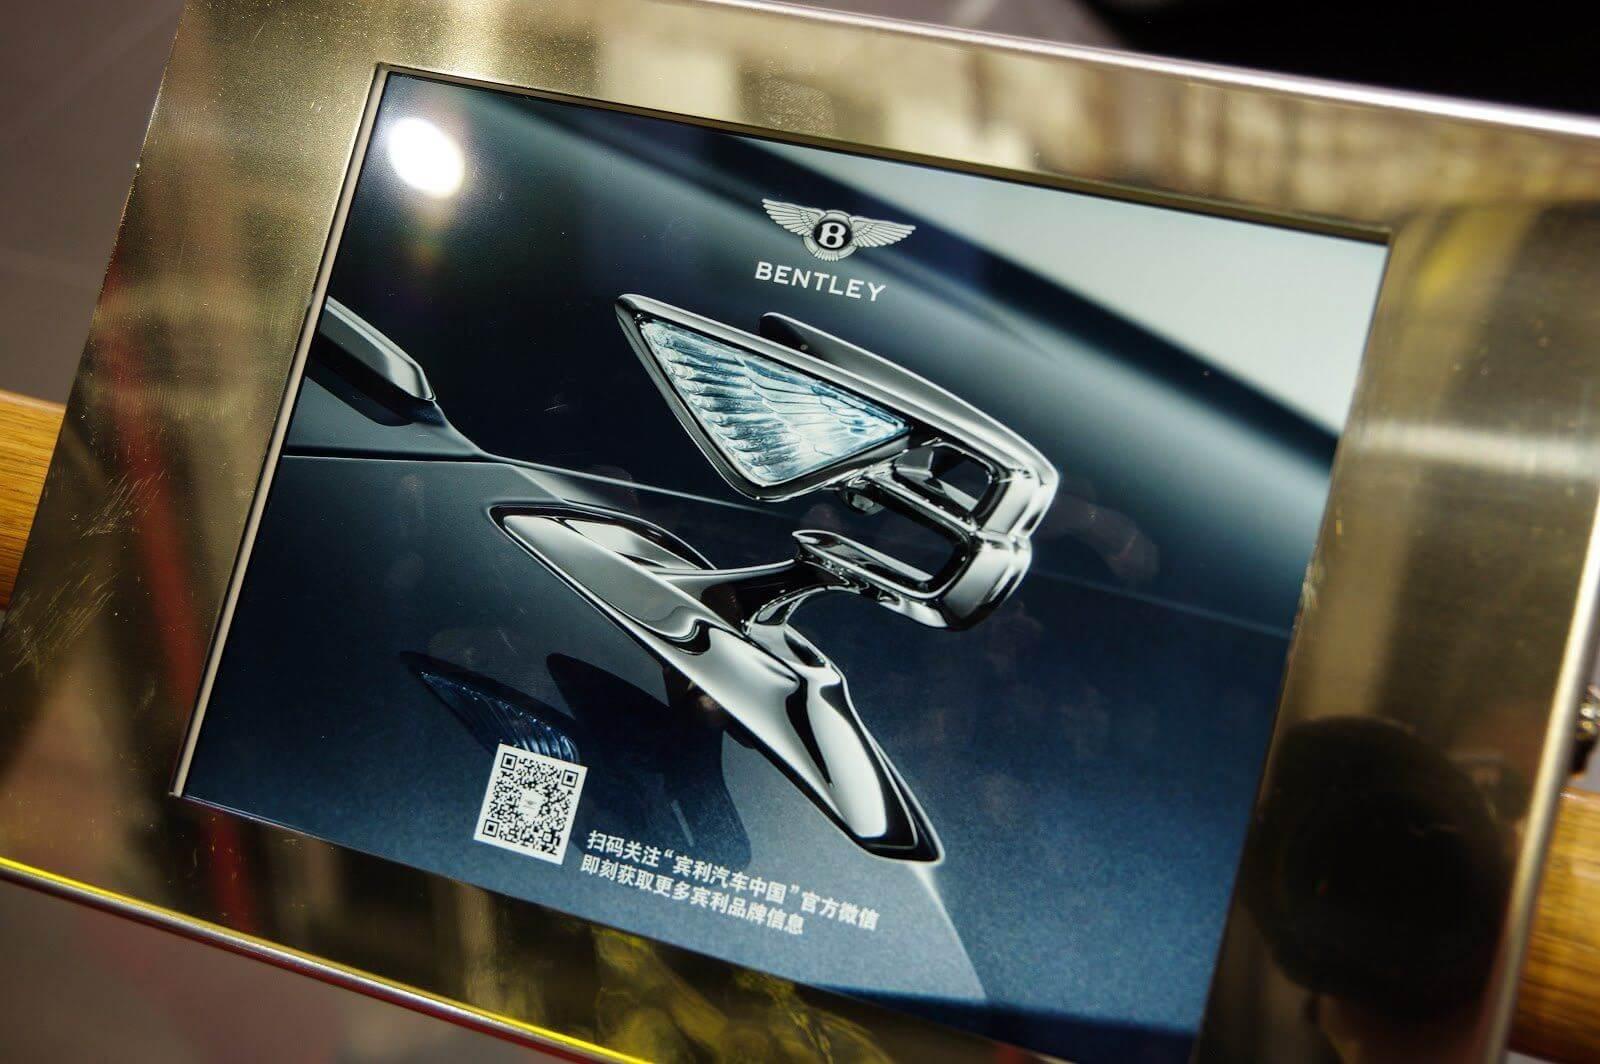 QR Codes for Luxury Goods